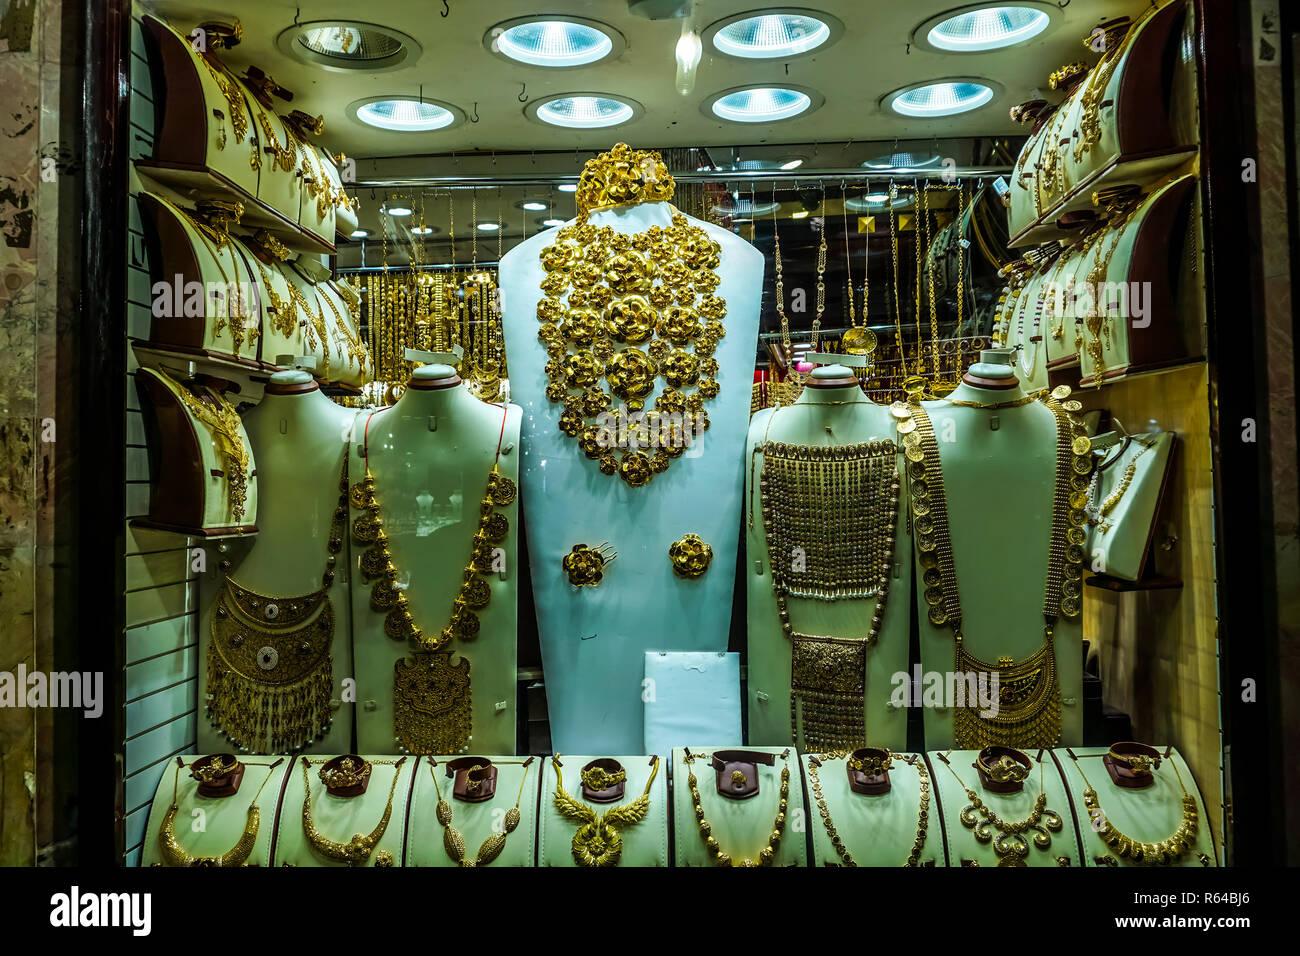 Dubai Gold Souk Jewelry Decoration Ornament at Shop Showcases - Stock Image